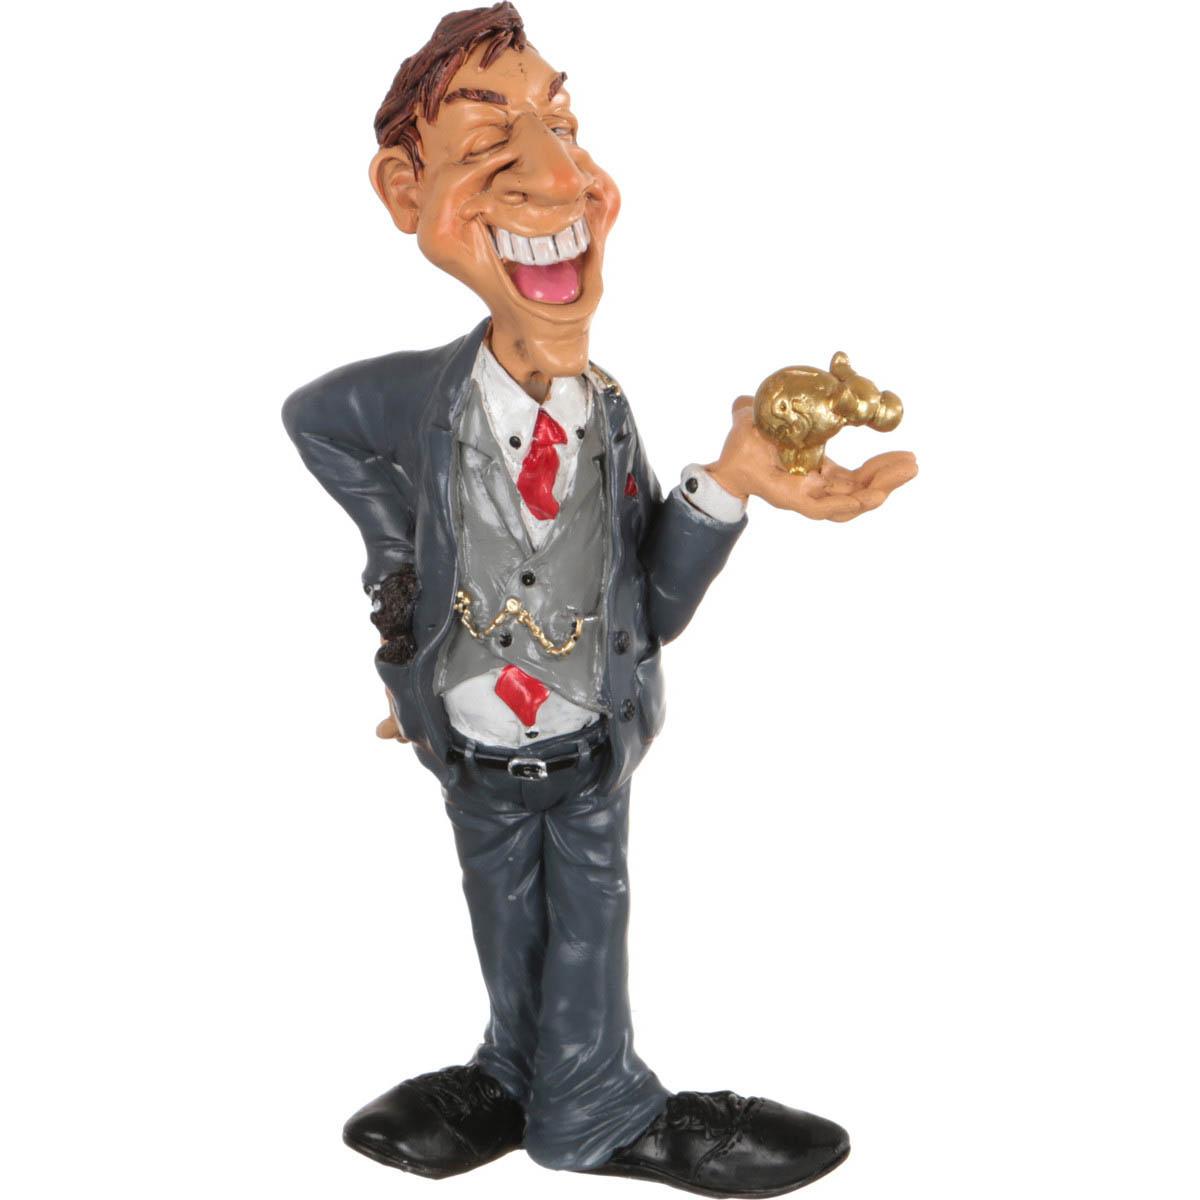 {} The Comical World Фигурка Бизнесмен (18 см) фигурки the comical world of stratford фигурка петух желаю роскошной жизни